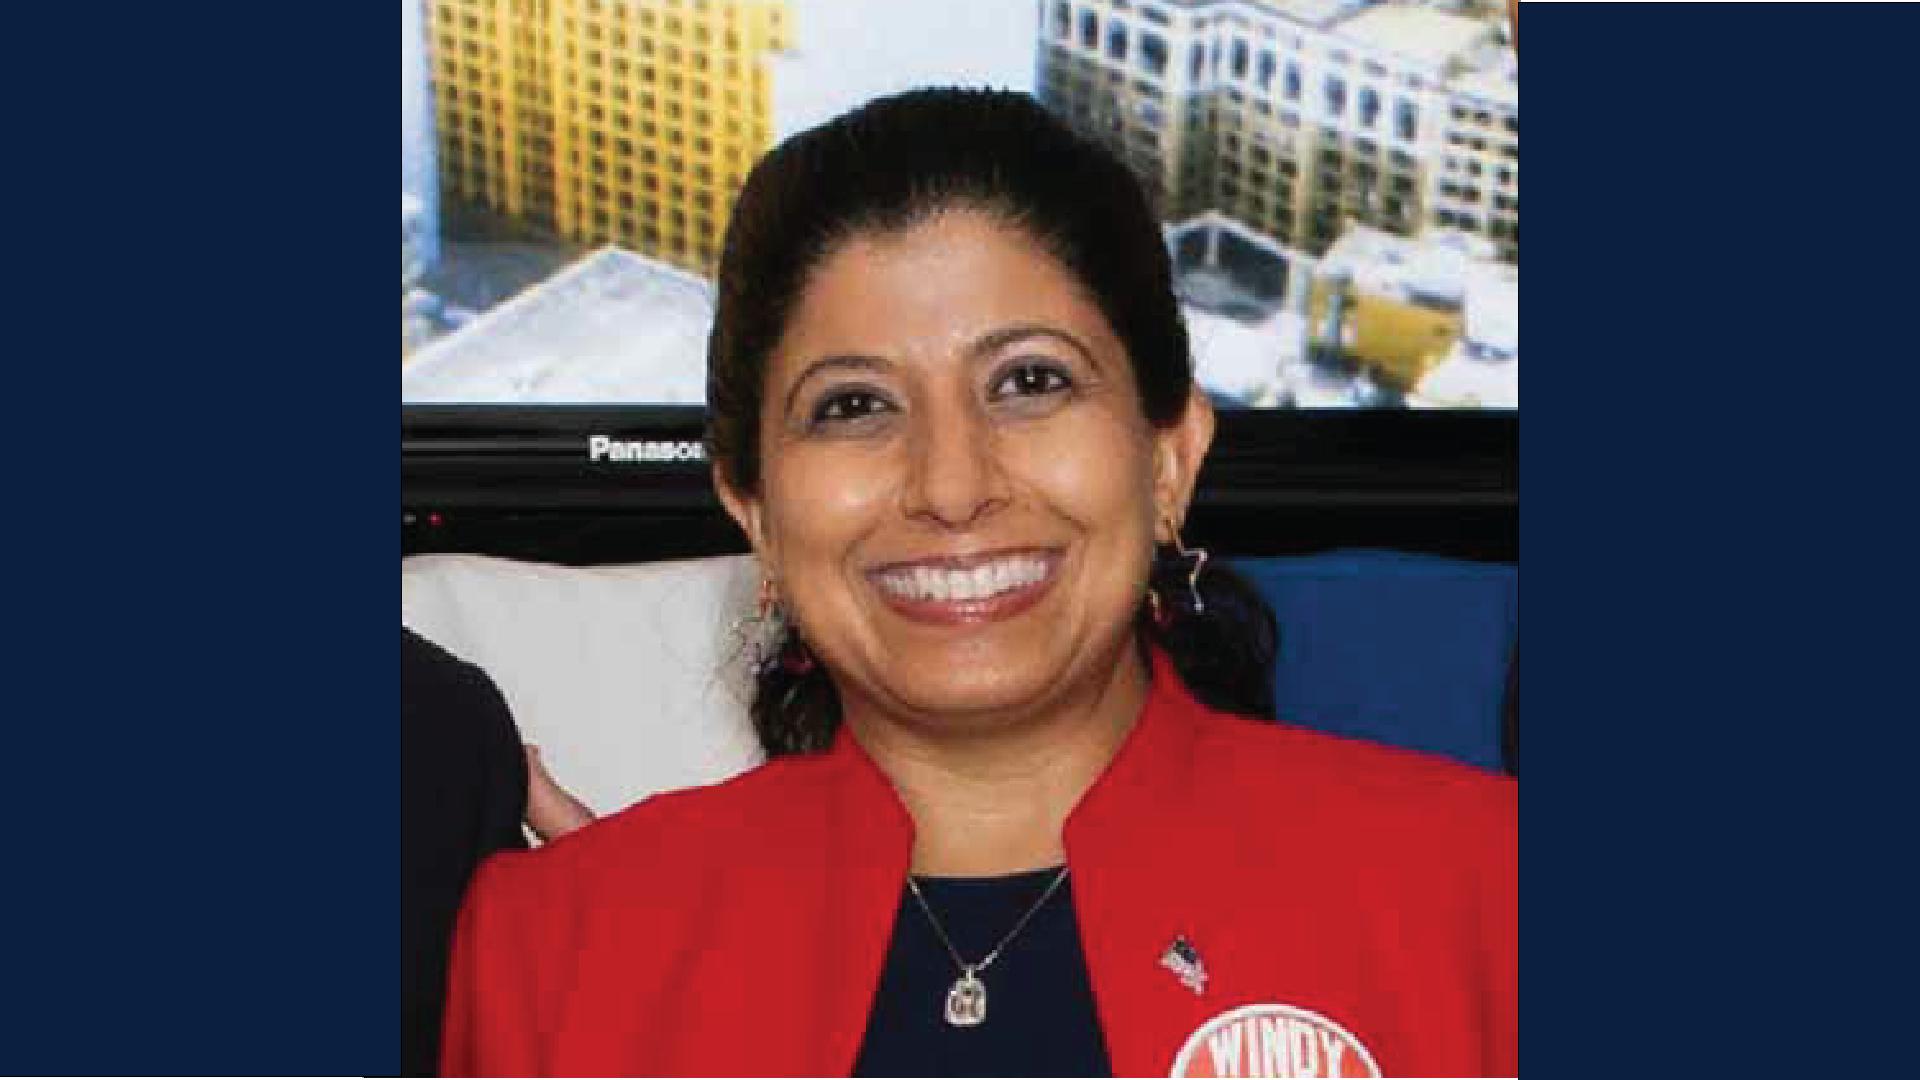 headshot of Nazima Rasick wearing a red blazer and smiling